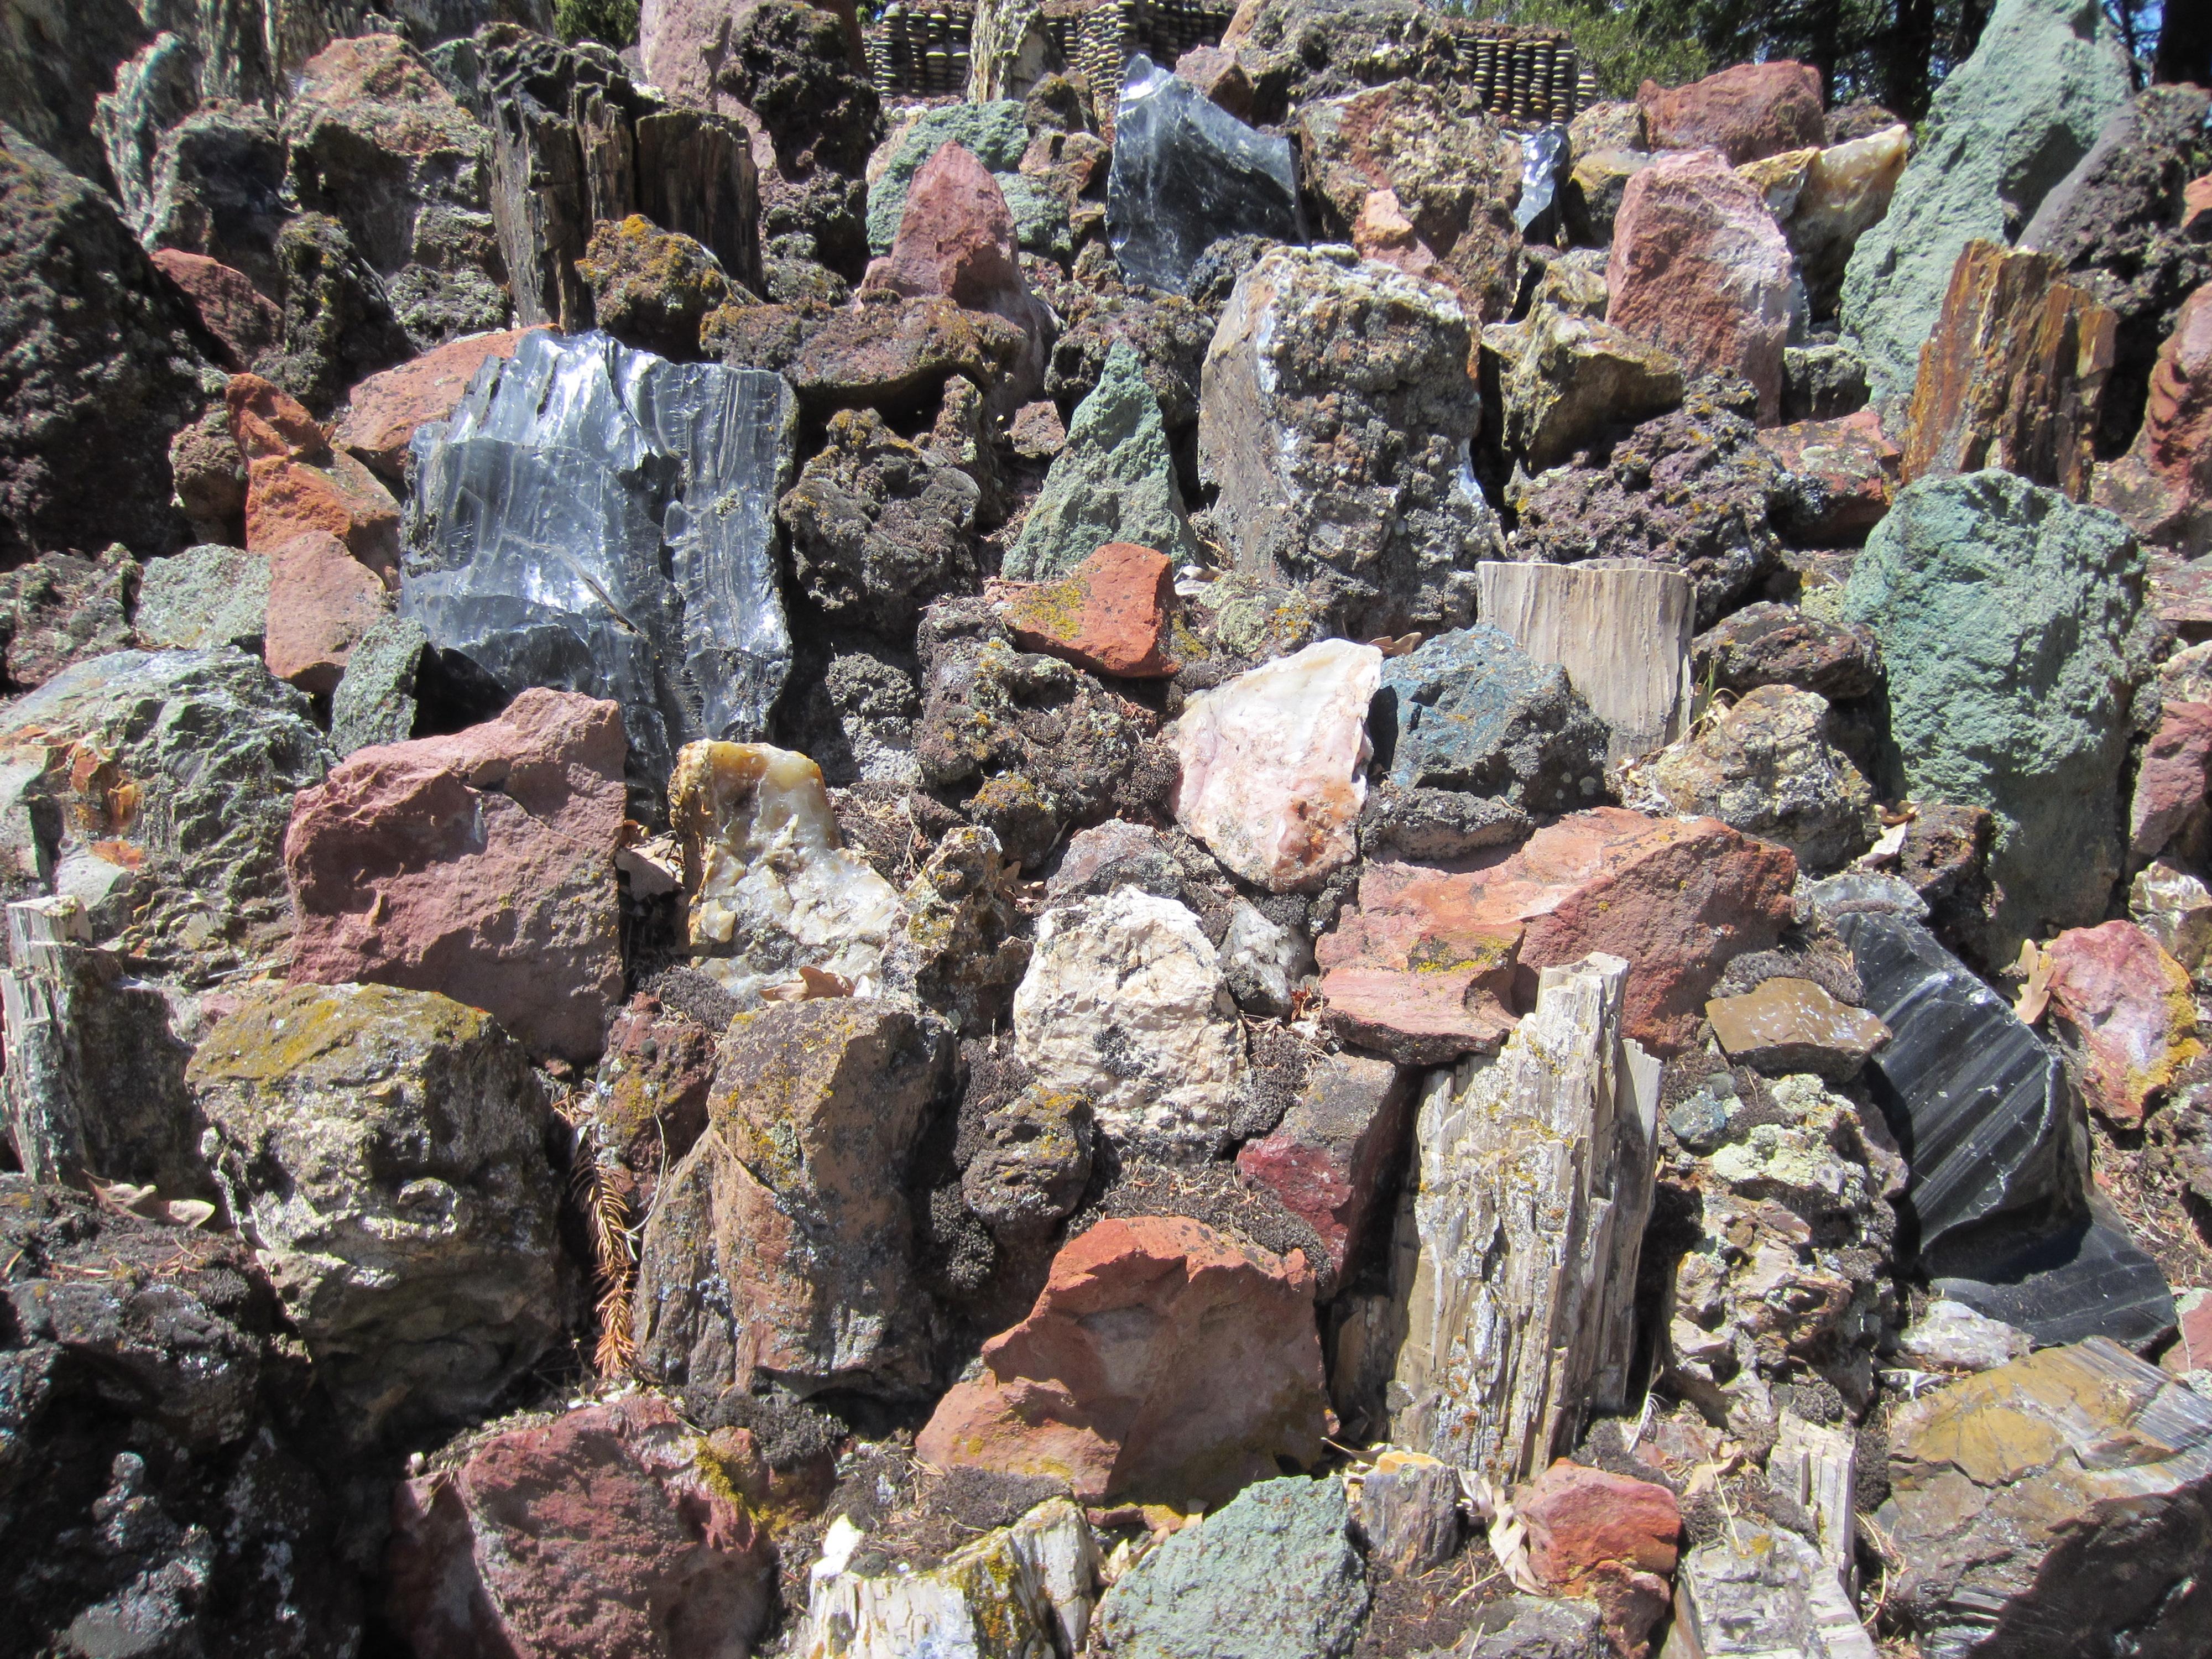 Attirant File:Petersen Rock Garden   Oregon (2013)   36.JPG